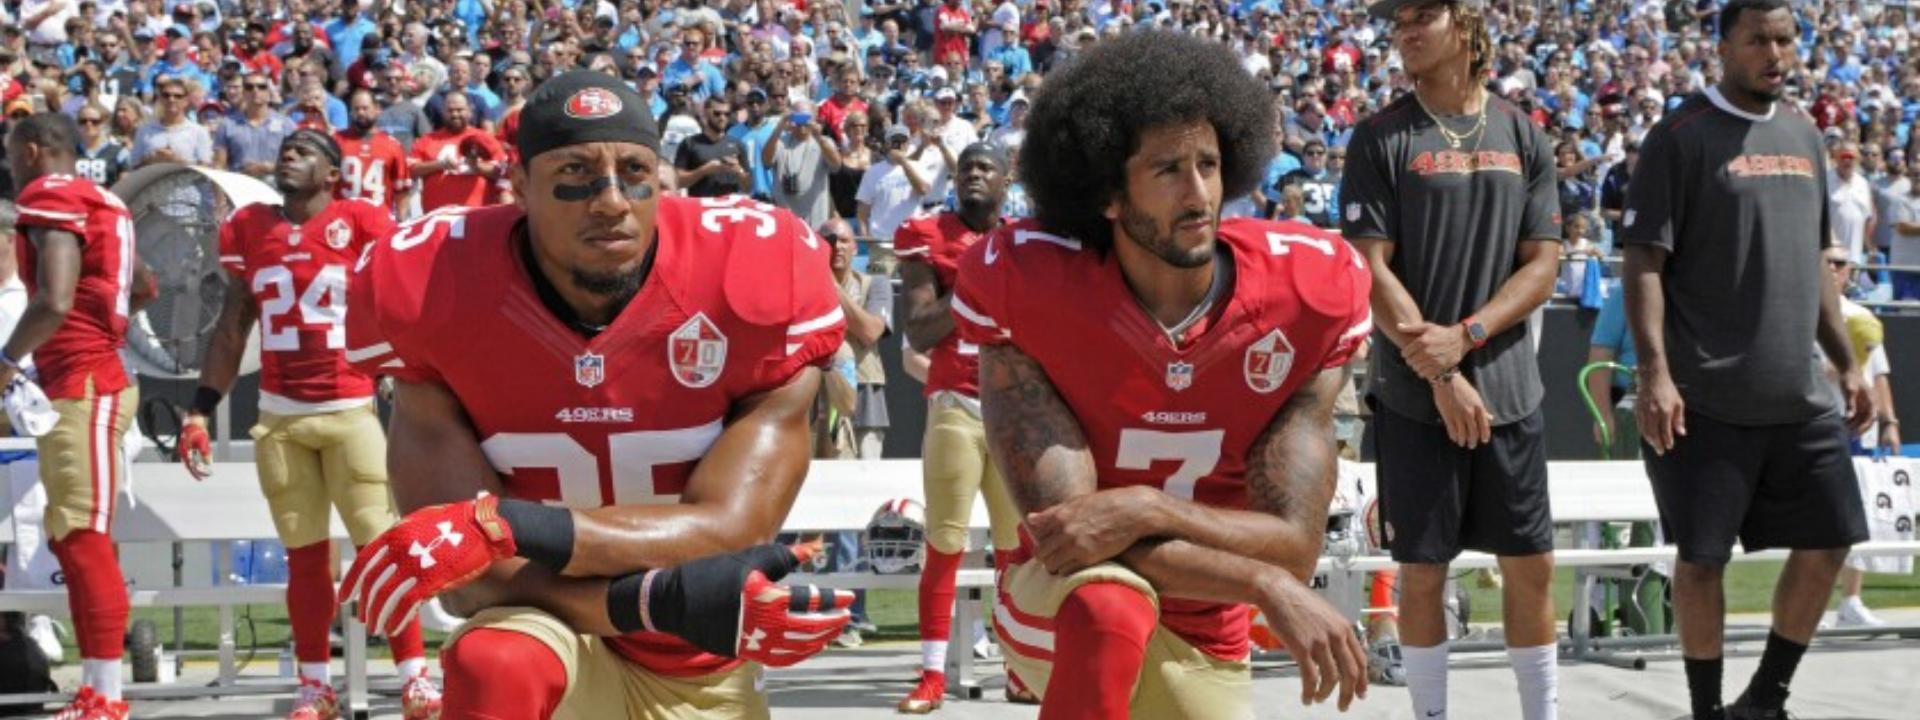 Colin Kaepernick kneeling to protest police brutality